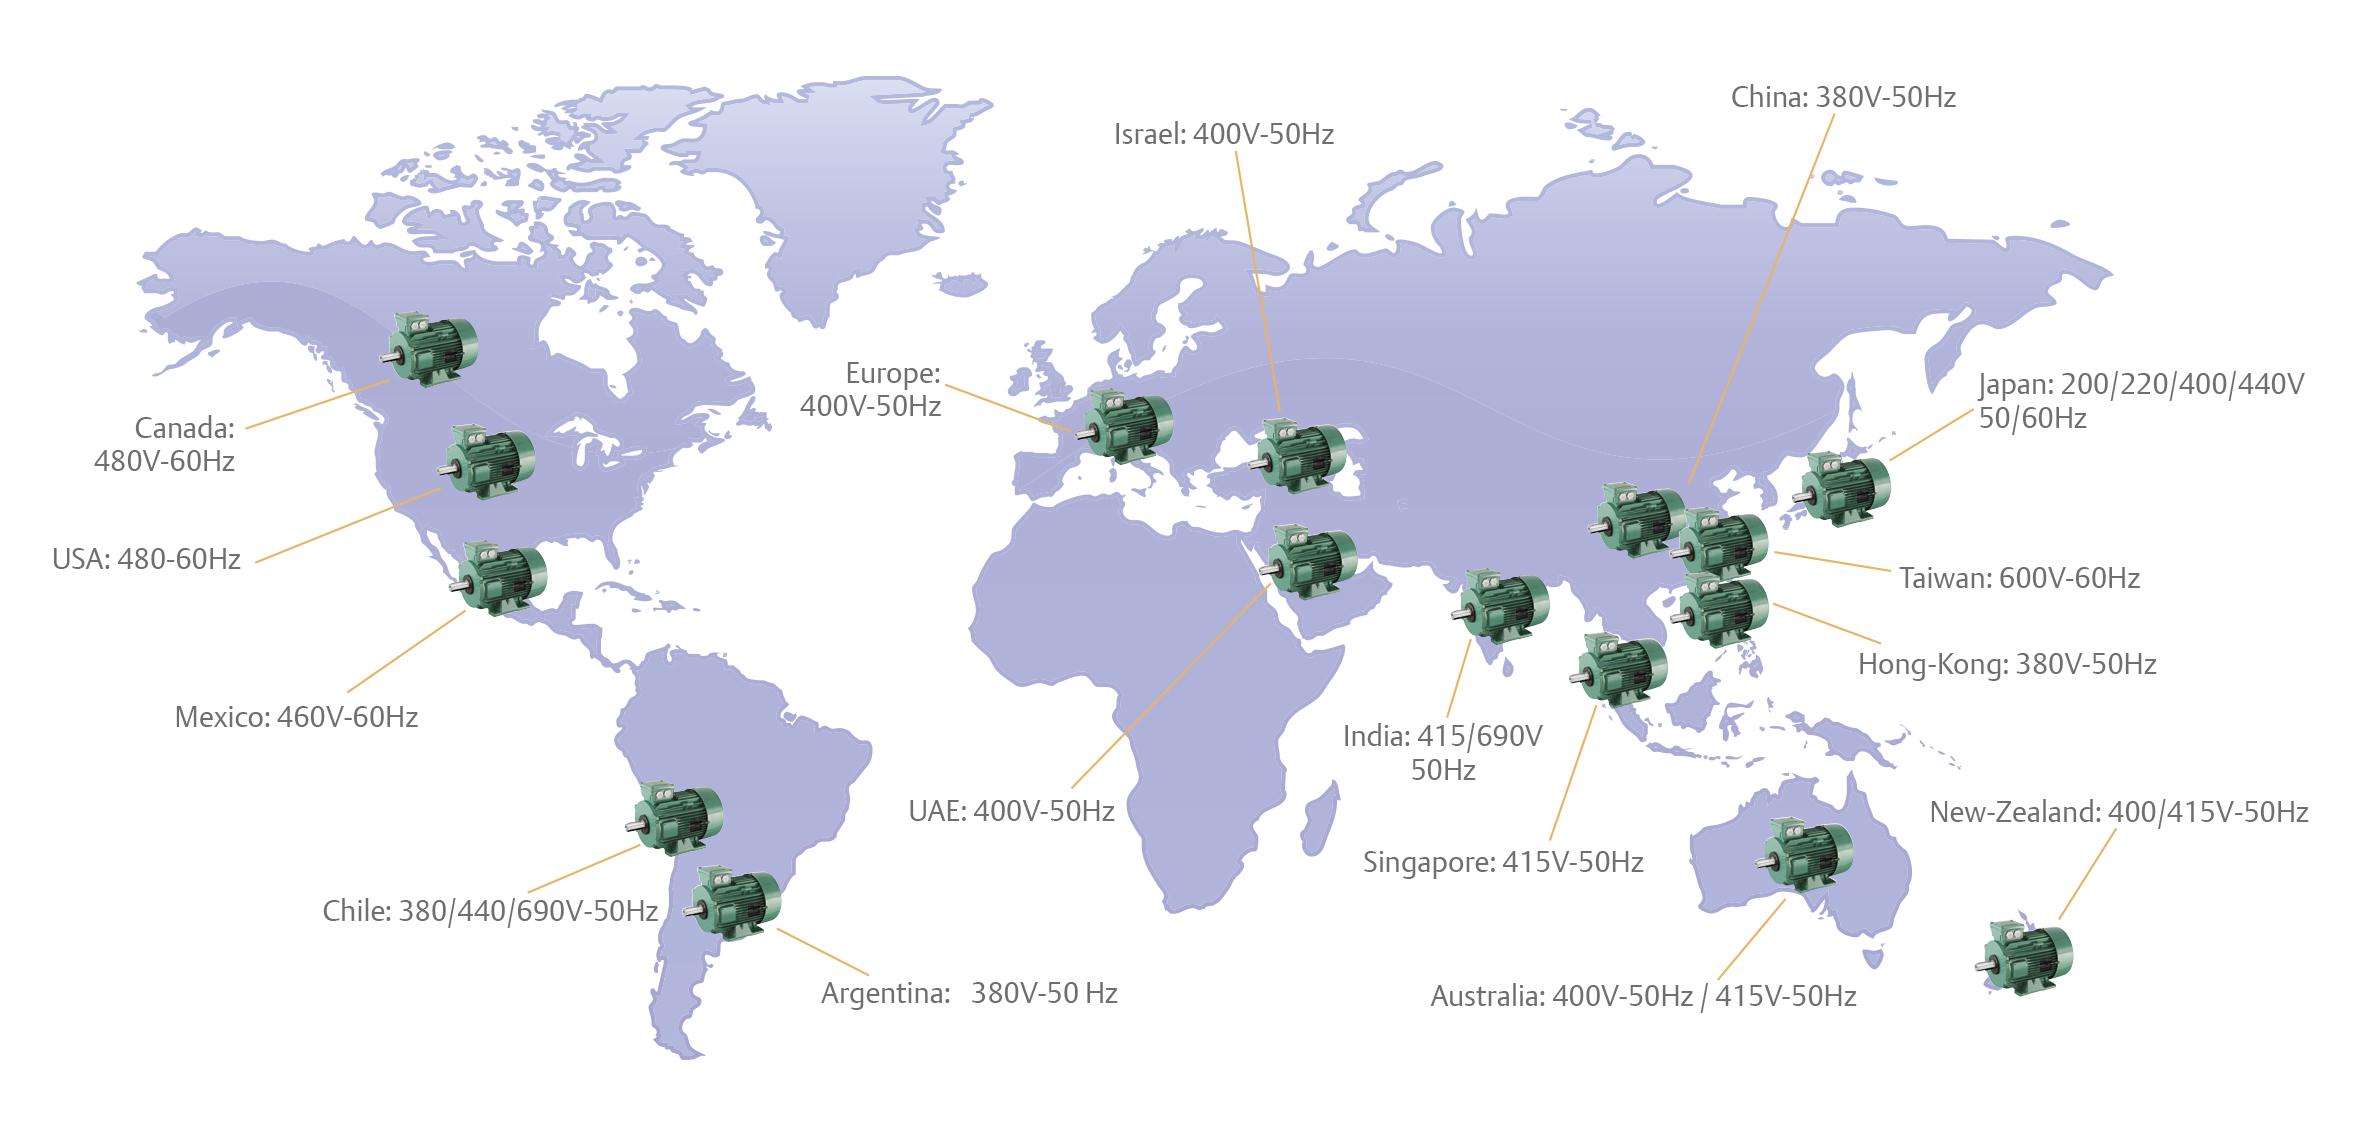 verdenskort med verdensdele